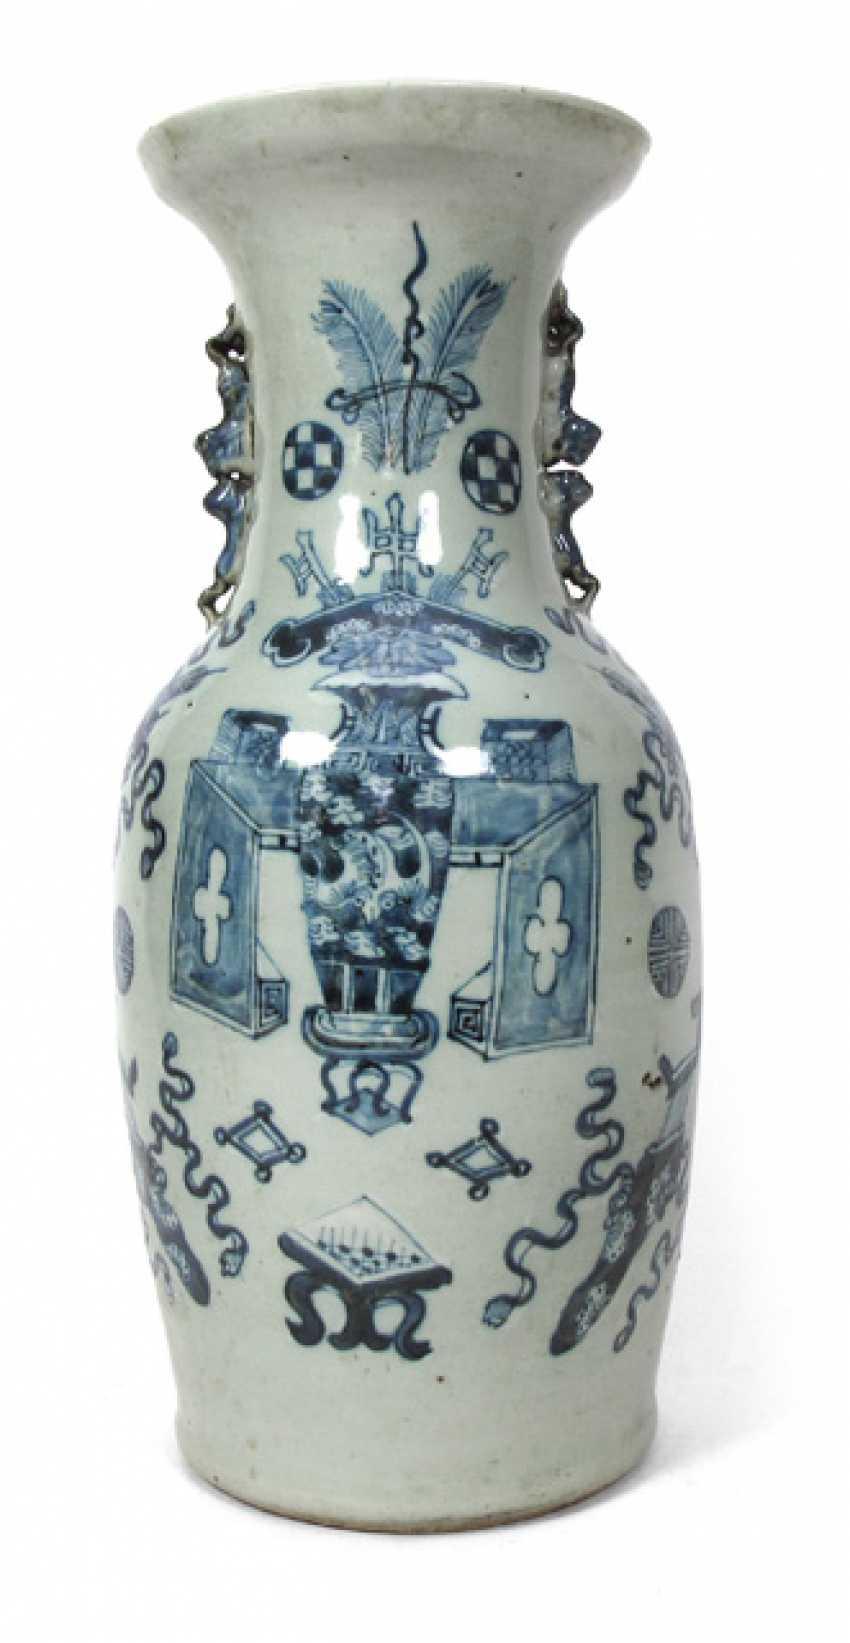 Underglaze blue Vase with various Antiques and emblems - photo 1